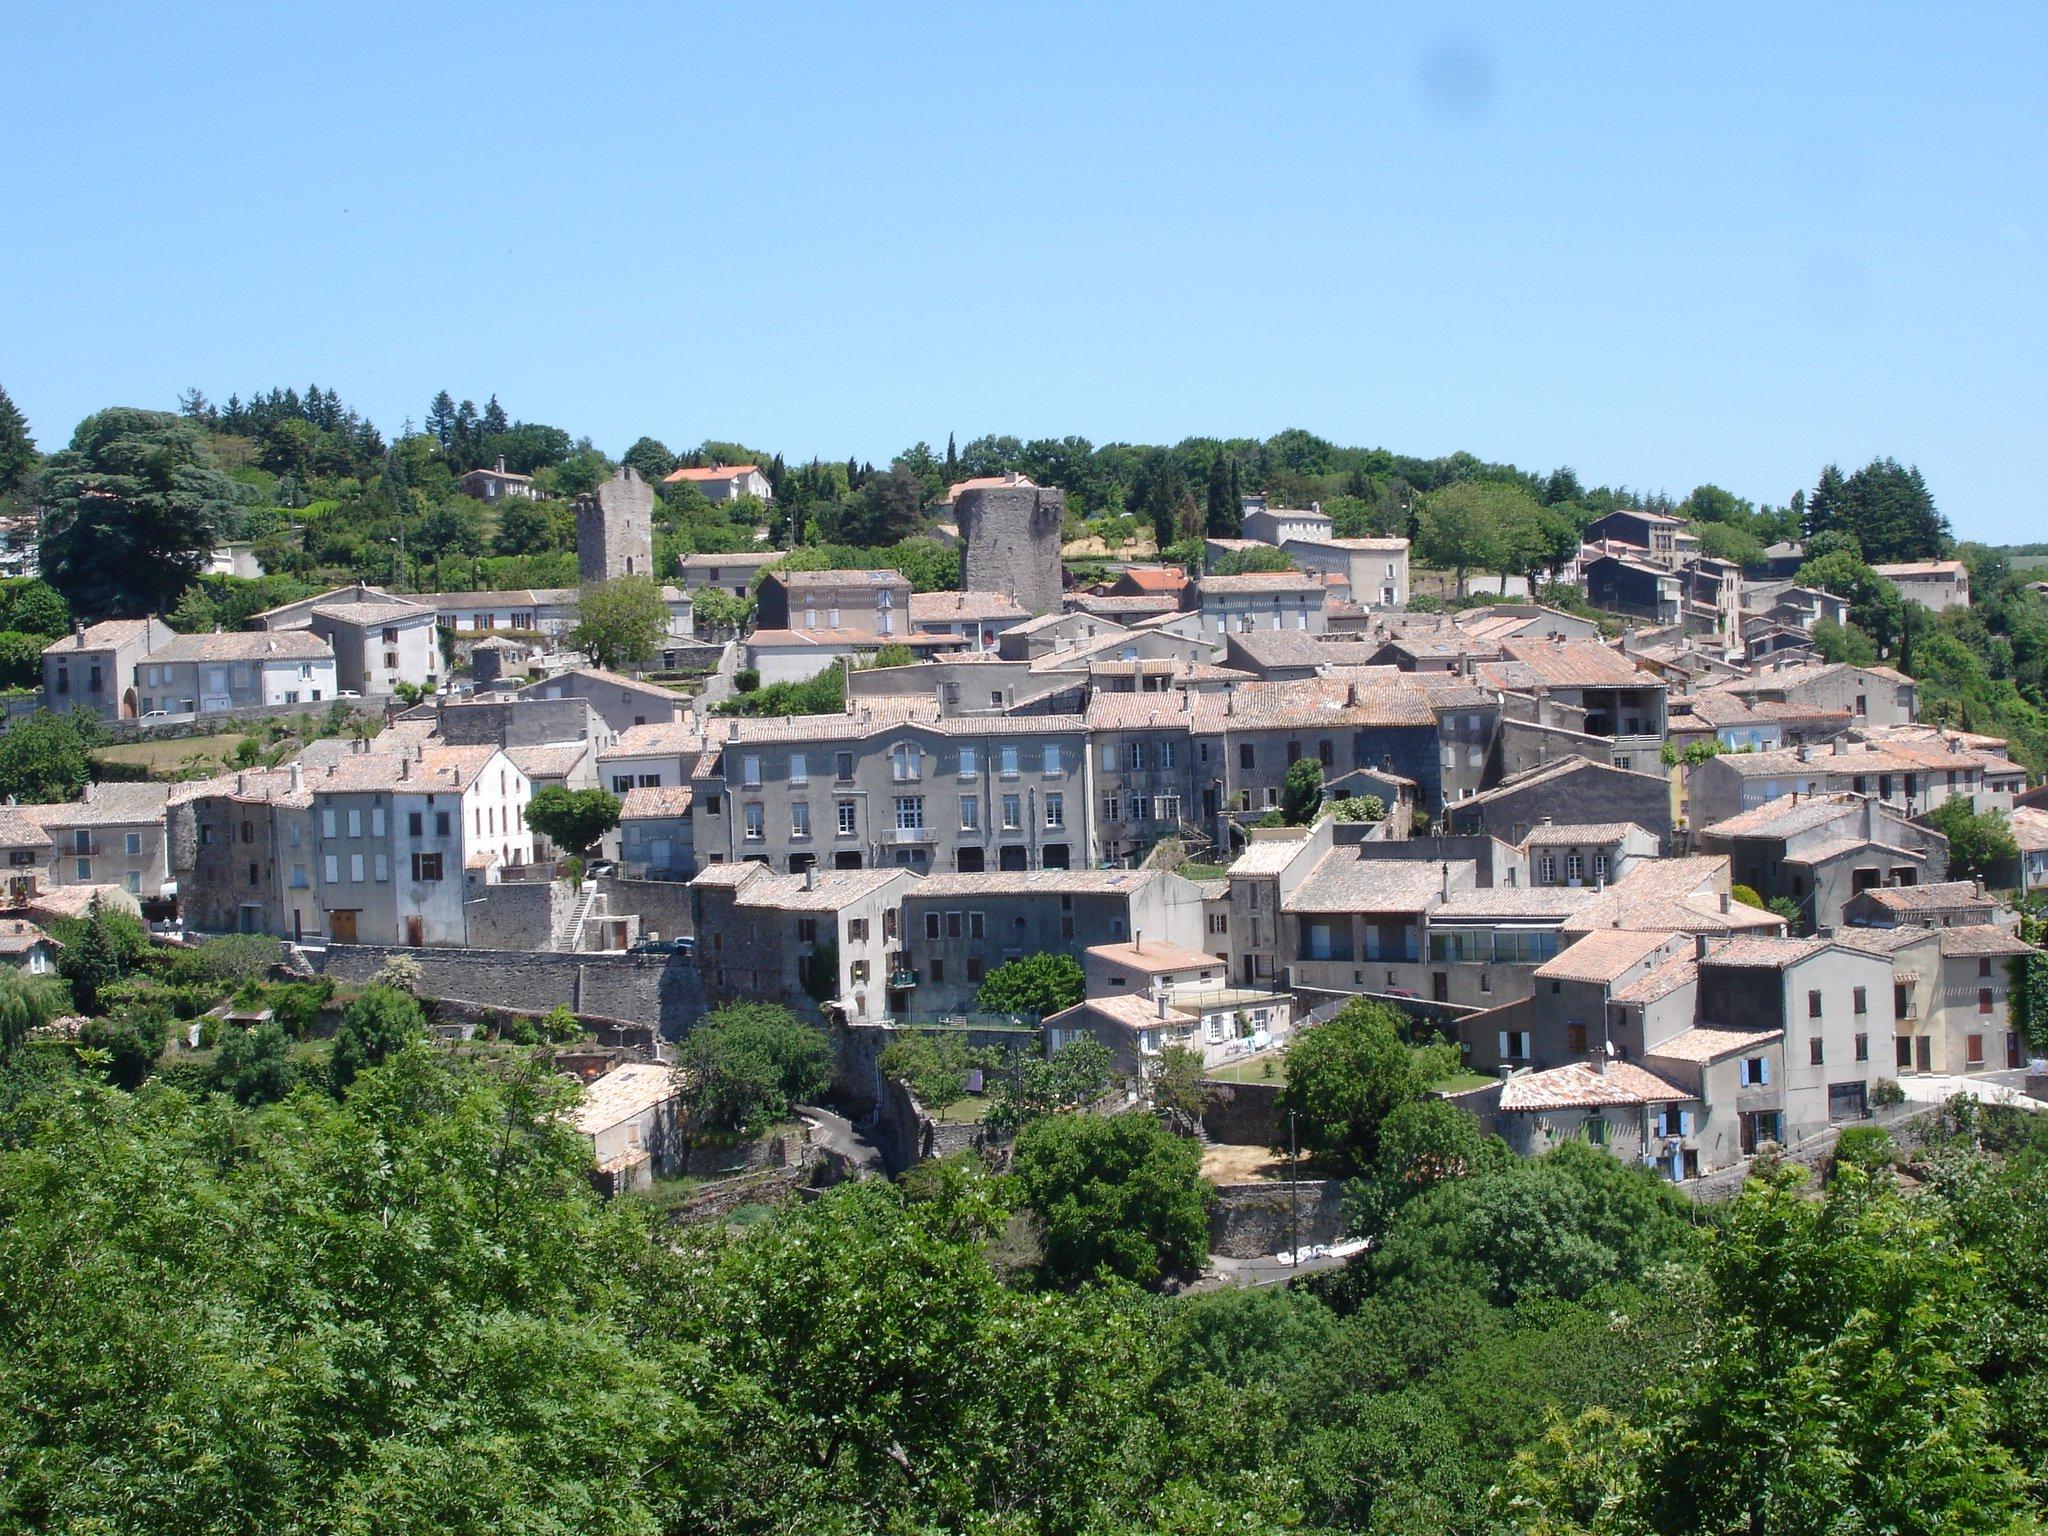 https://upload.wikimedia.org/wikipedia/commons/5/5c/France-Saissac-vue_d%27ensemble.jpg